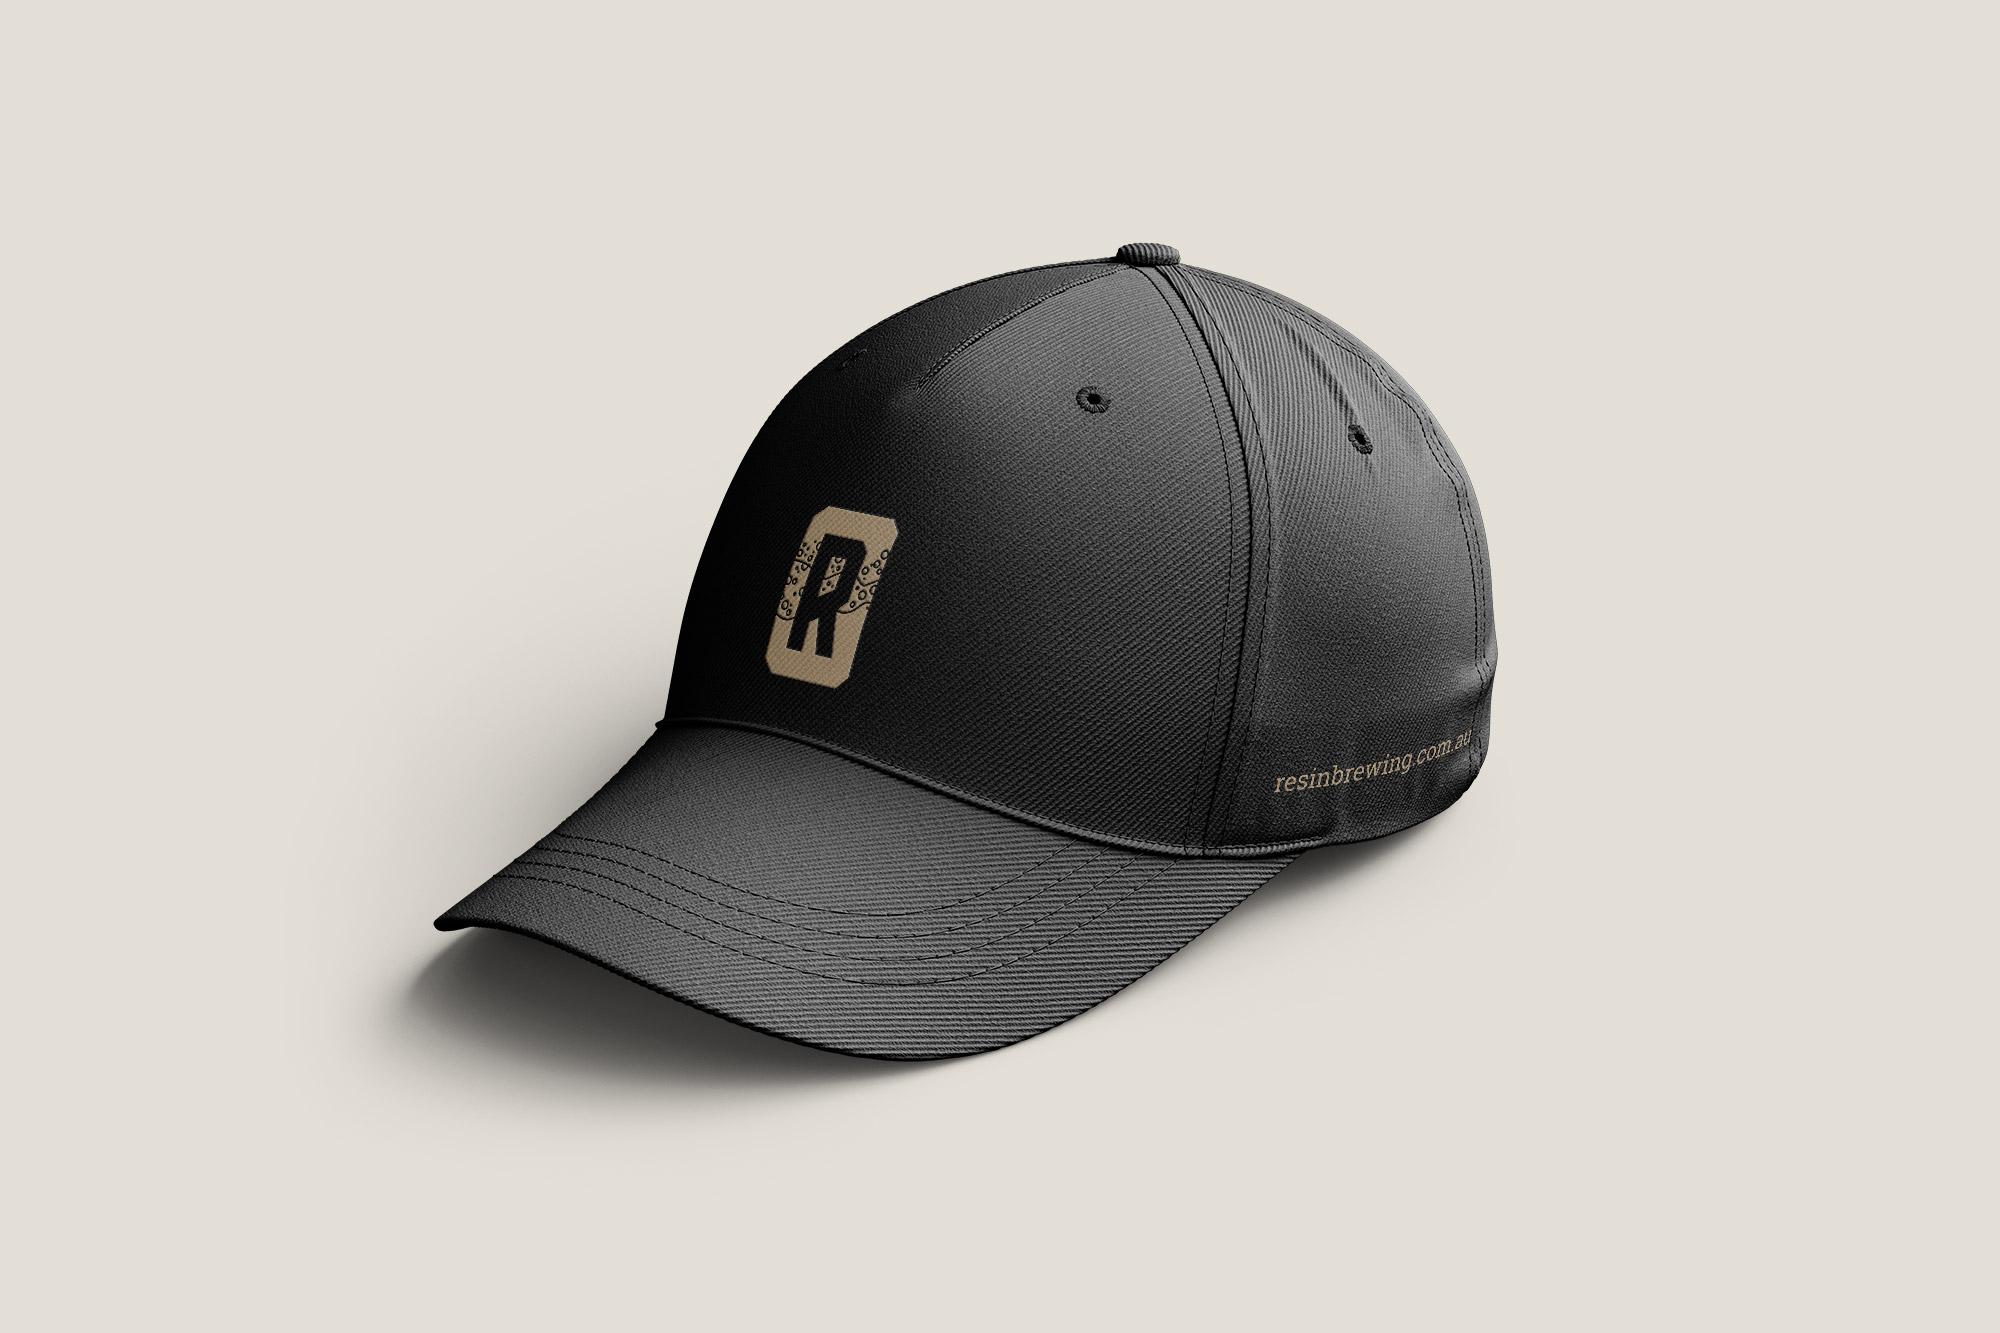 RESIN BREWING CAP